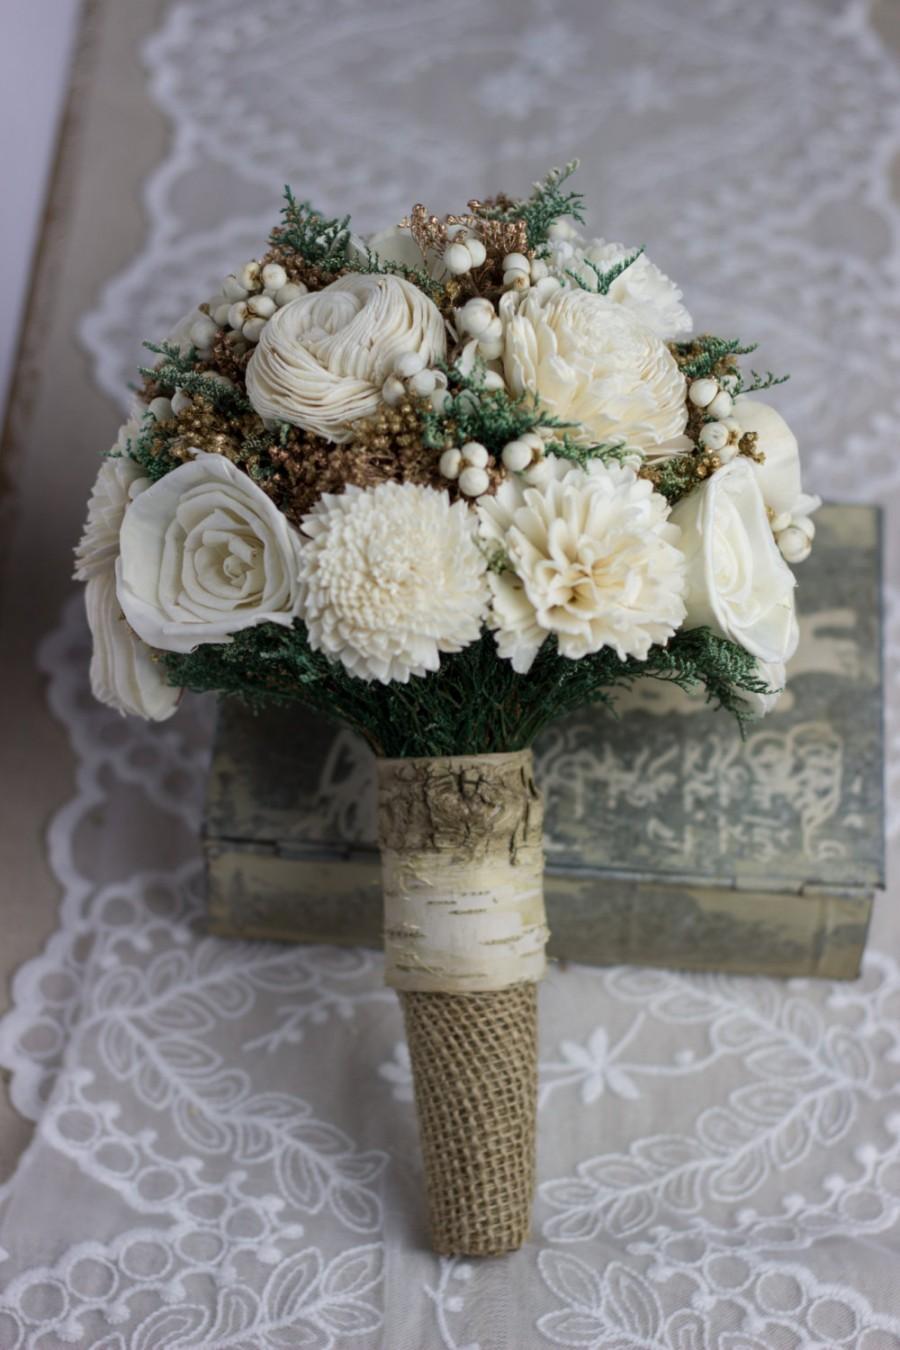 Mariage - Rustic Birch Wedding Bouquet, Ivory Sola Flower Bridal Bouquet, Woodland Bouquet, Rustic Bouquet, Winter Bouquet Keepsake Bouquet